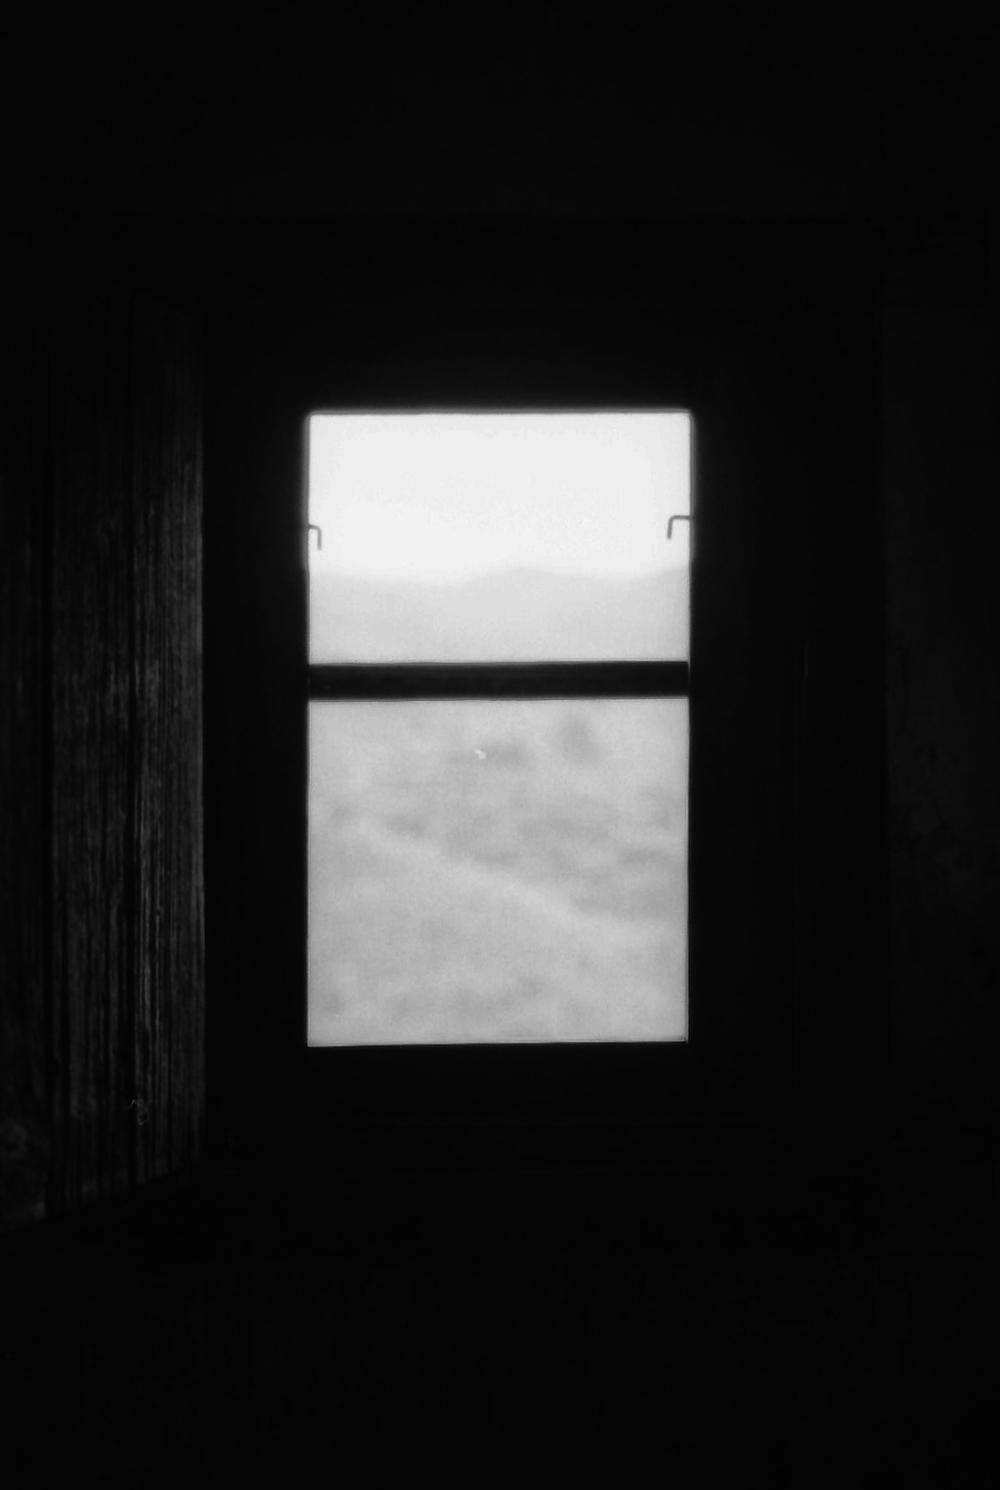 WIDOW, SILVER GELATIN PRINT, 2011